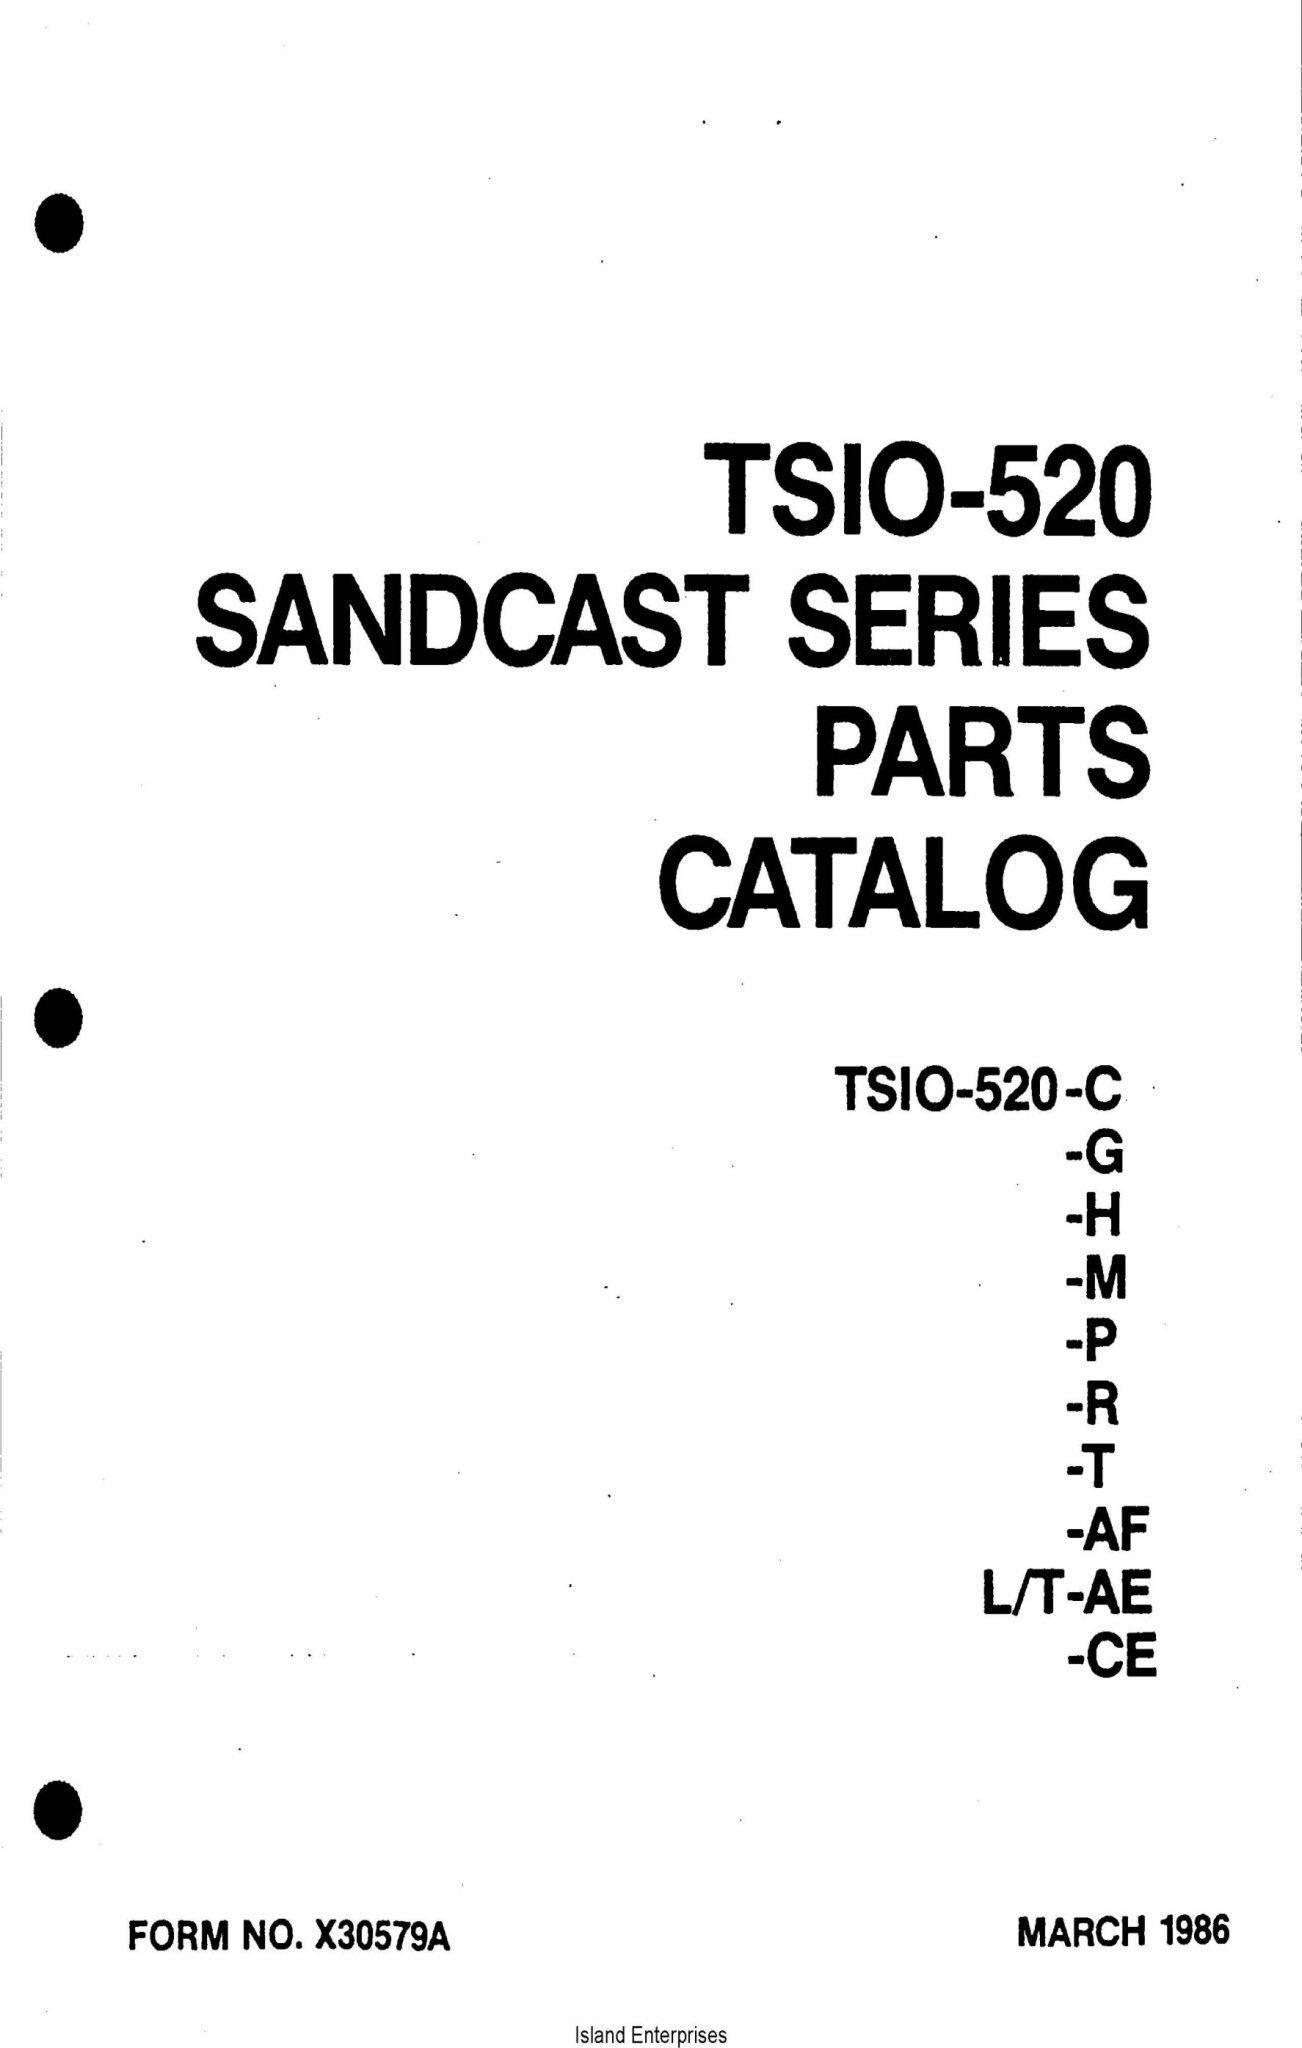 Continental Model TS10-520 C,G,H,M,P,R,T,AF,L/T,AE,CE